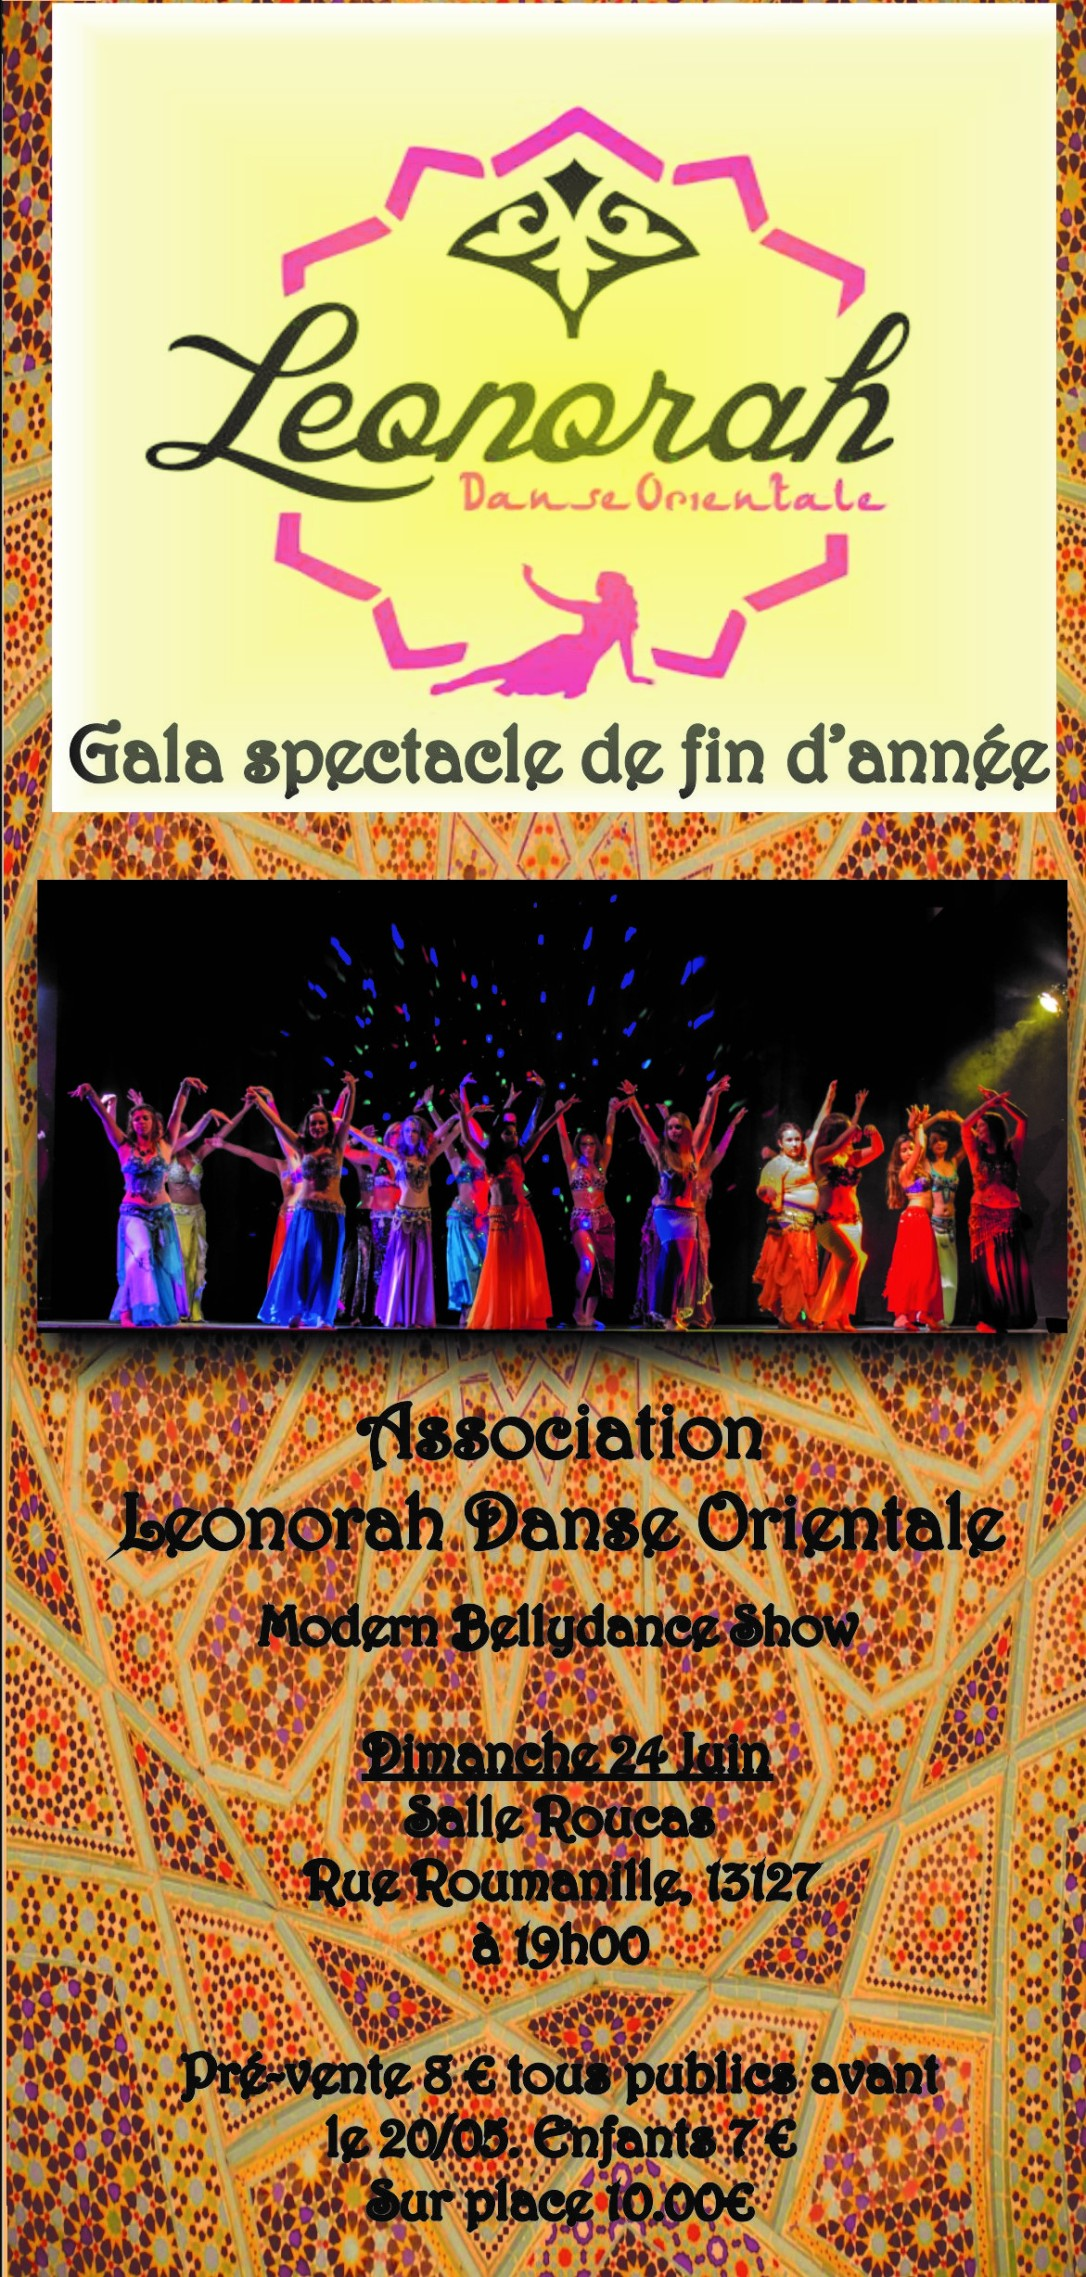 flyers leonorah danse (1)